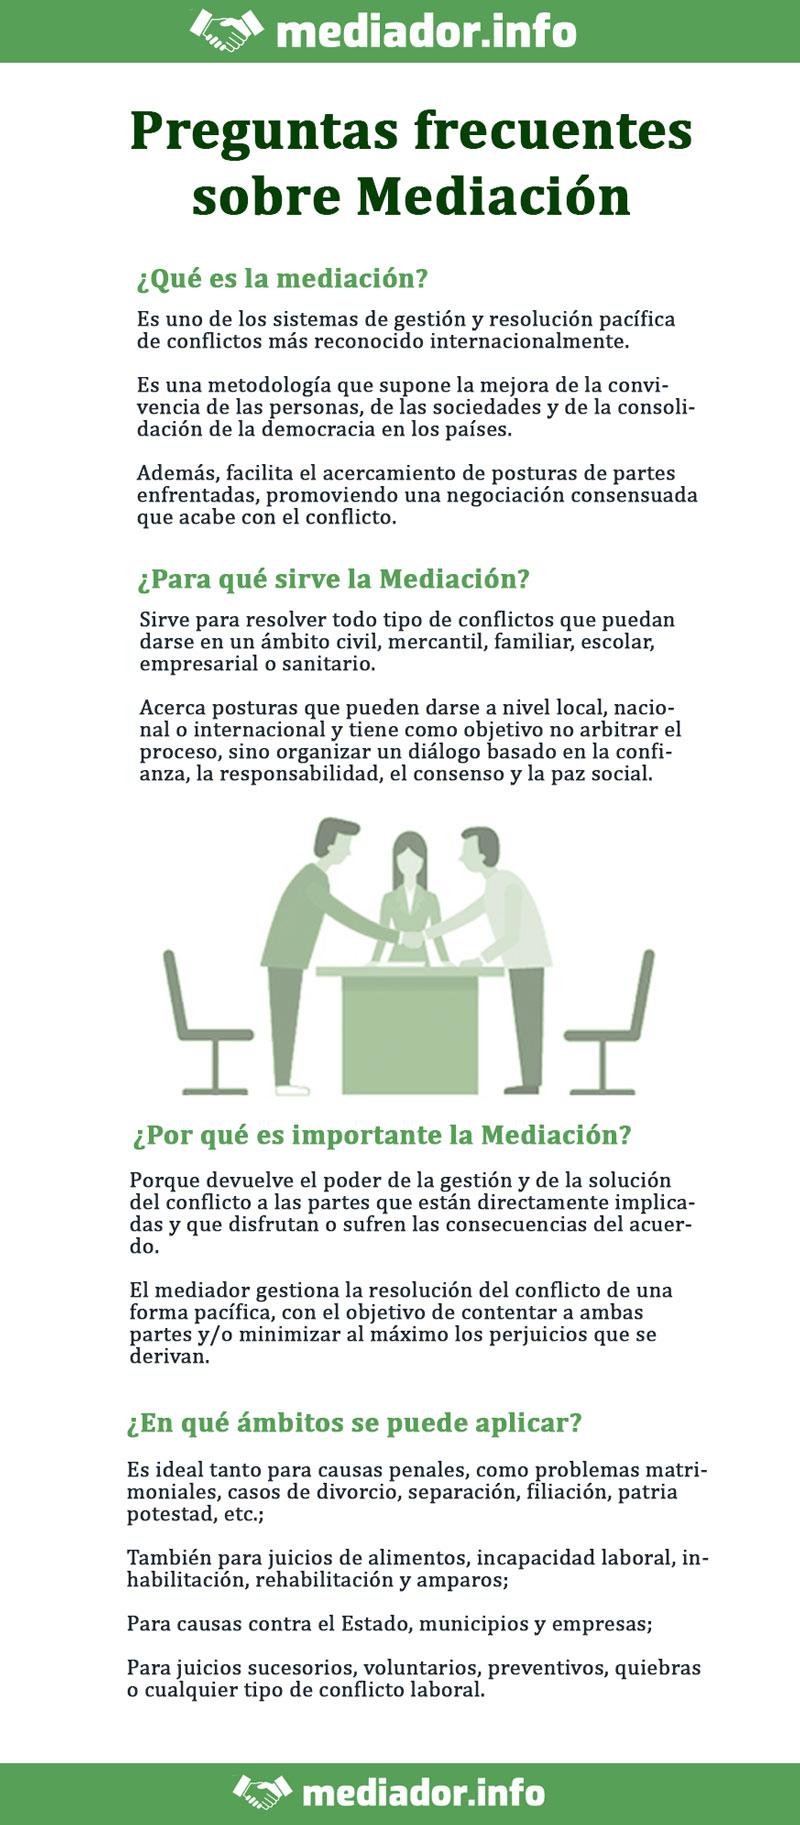 infografia información sobre la mediación